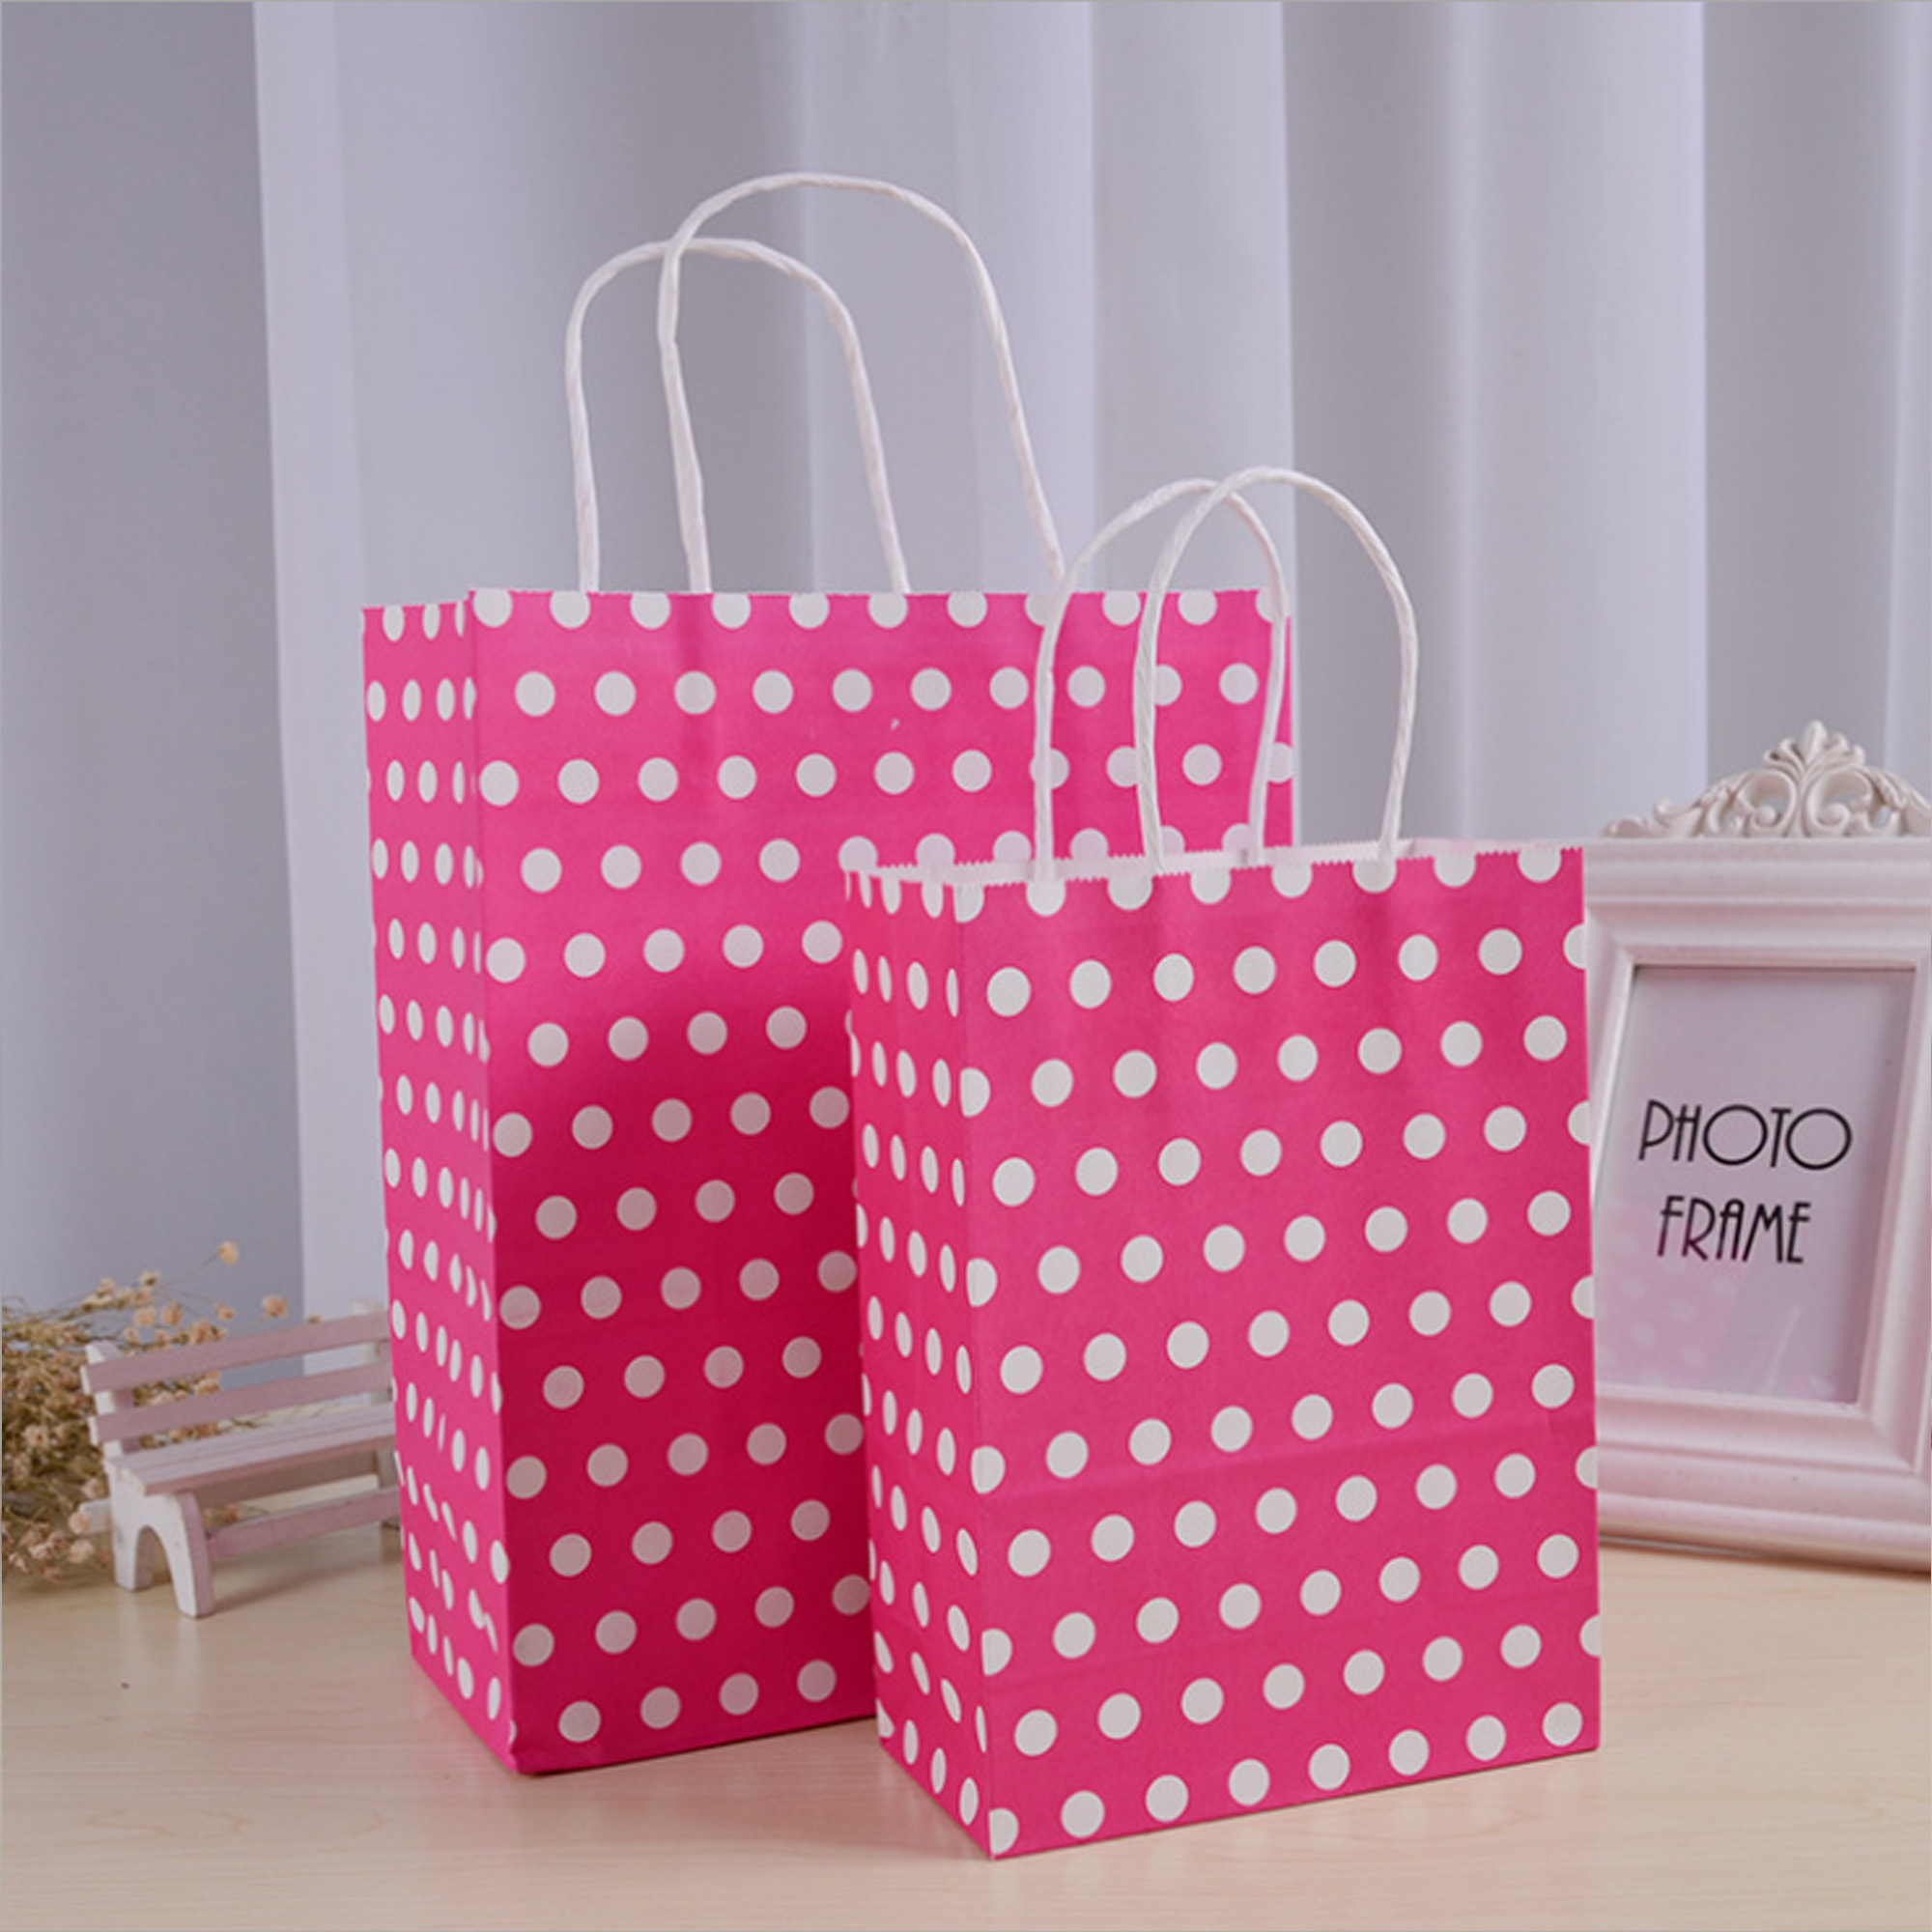 5.91x3.15x8.27in Purple Polka Dot Paper Kraft Christmas Gift Shopping Bag 12pcs